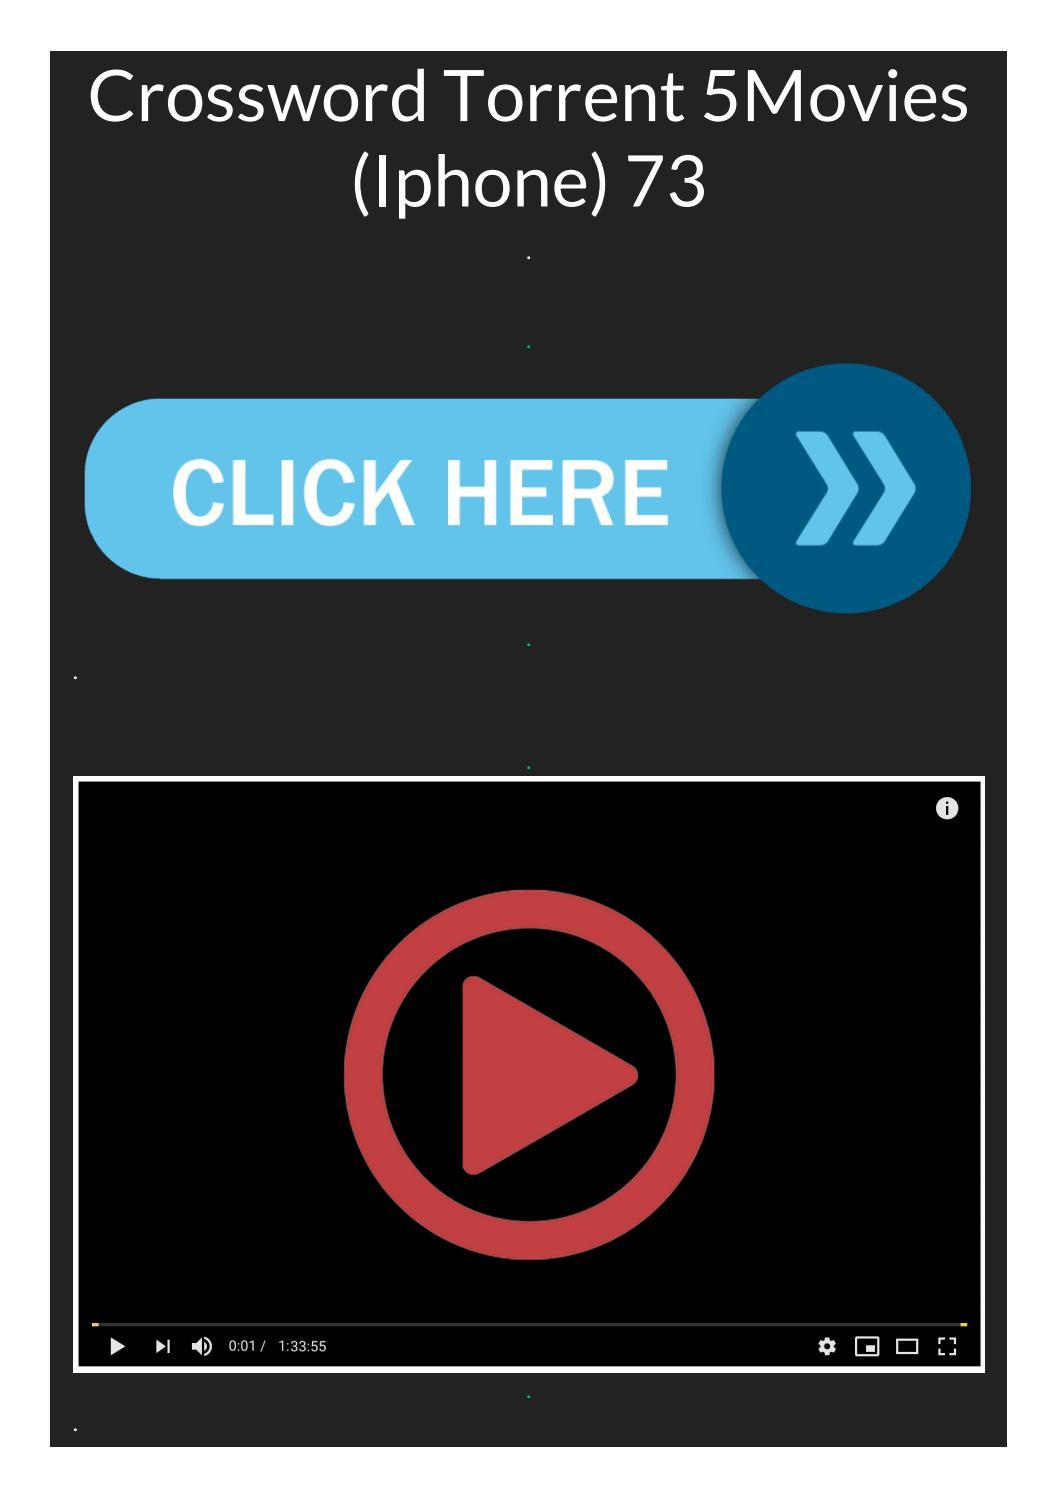 Crossword Torrent 5Movies (Iphone) 73Inlinadi - Issuu - Free Printable Universal Crossword